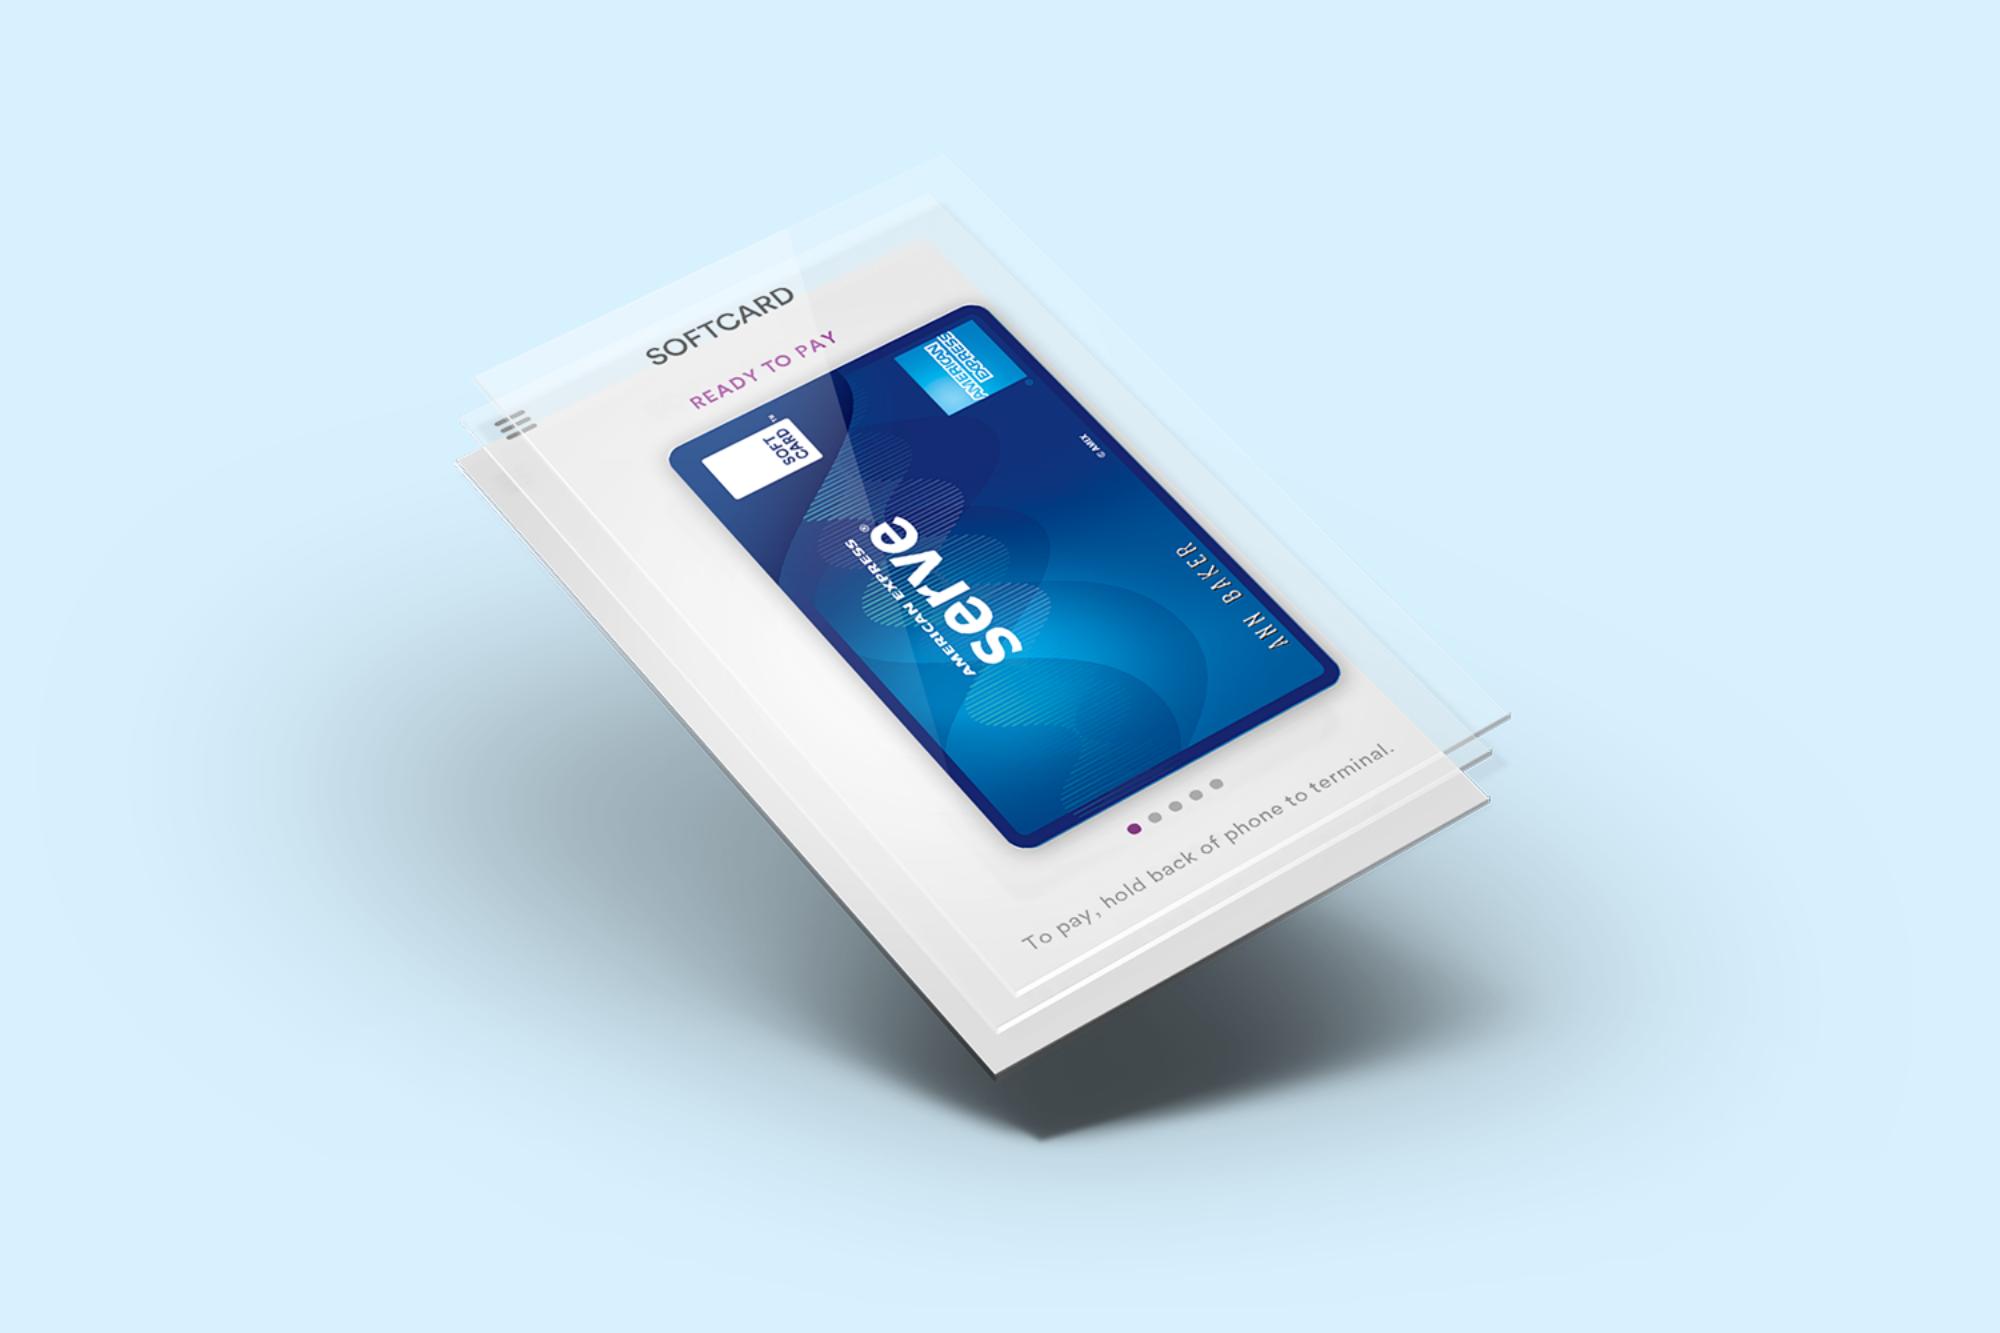 Softcard Mobile design, Branding design, My design